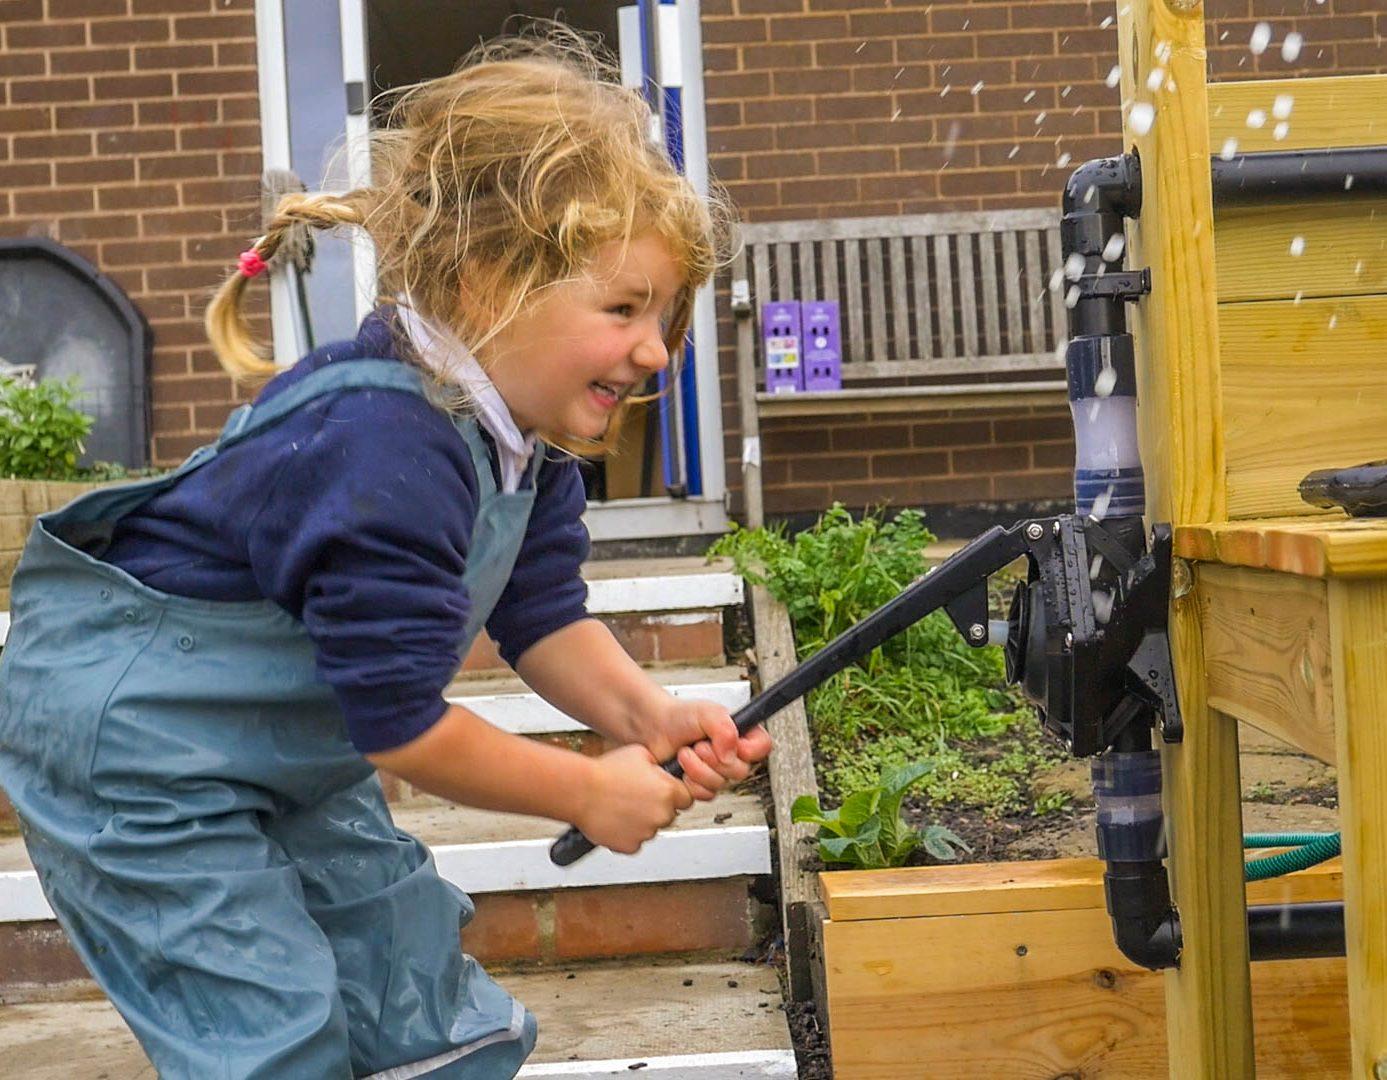 Rossett Acre Primary School – School of the Week